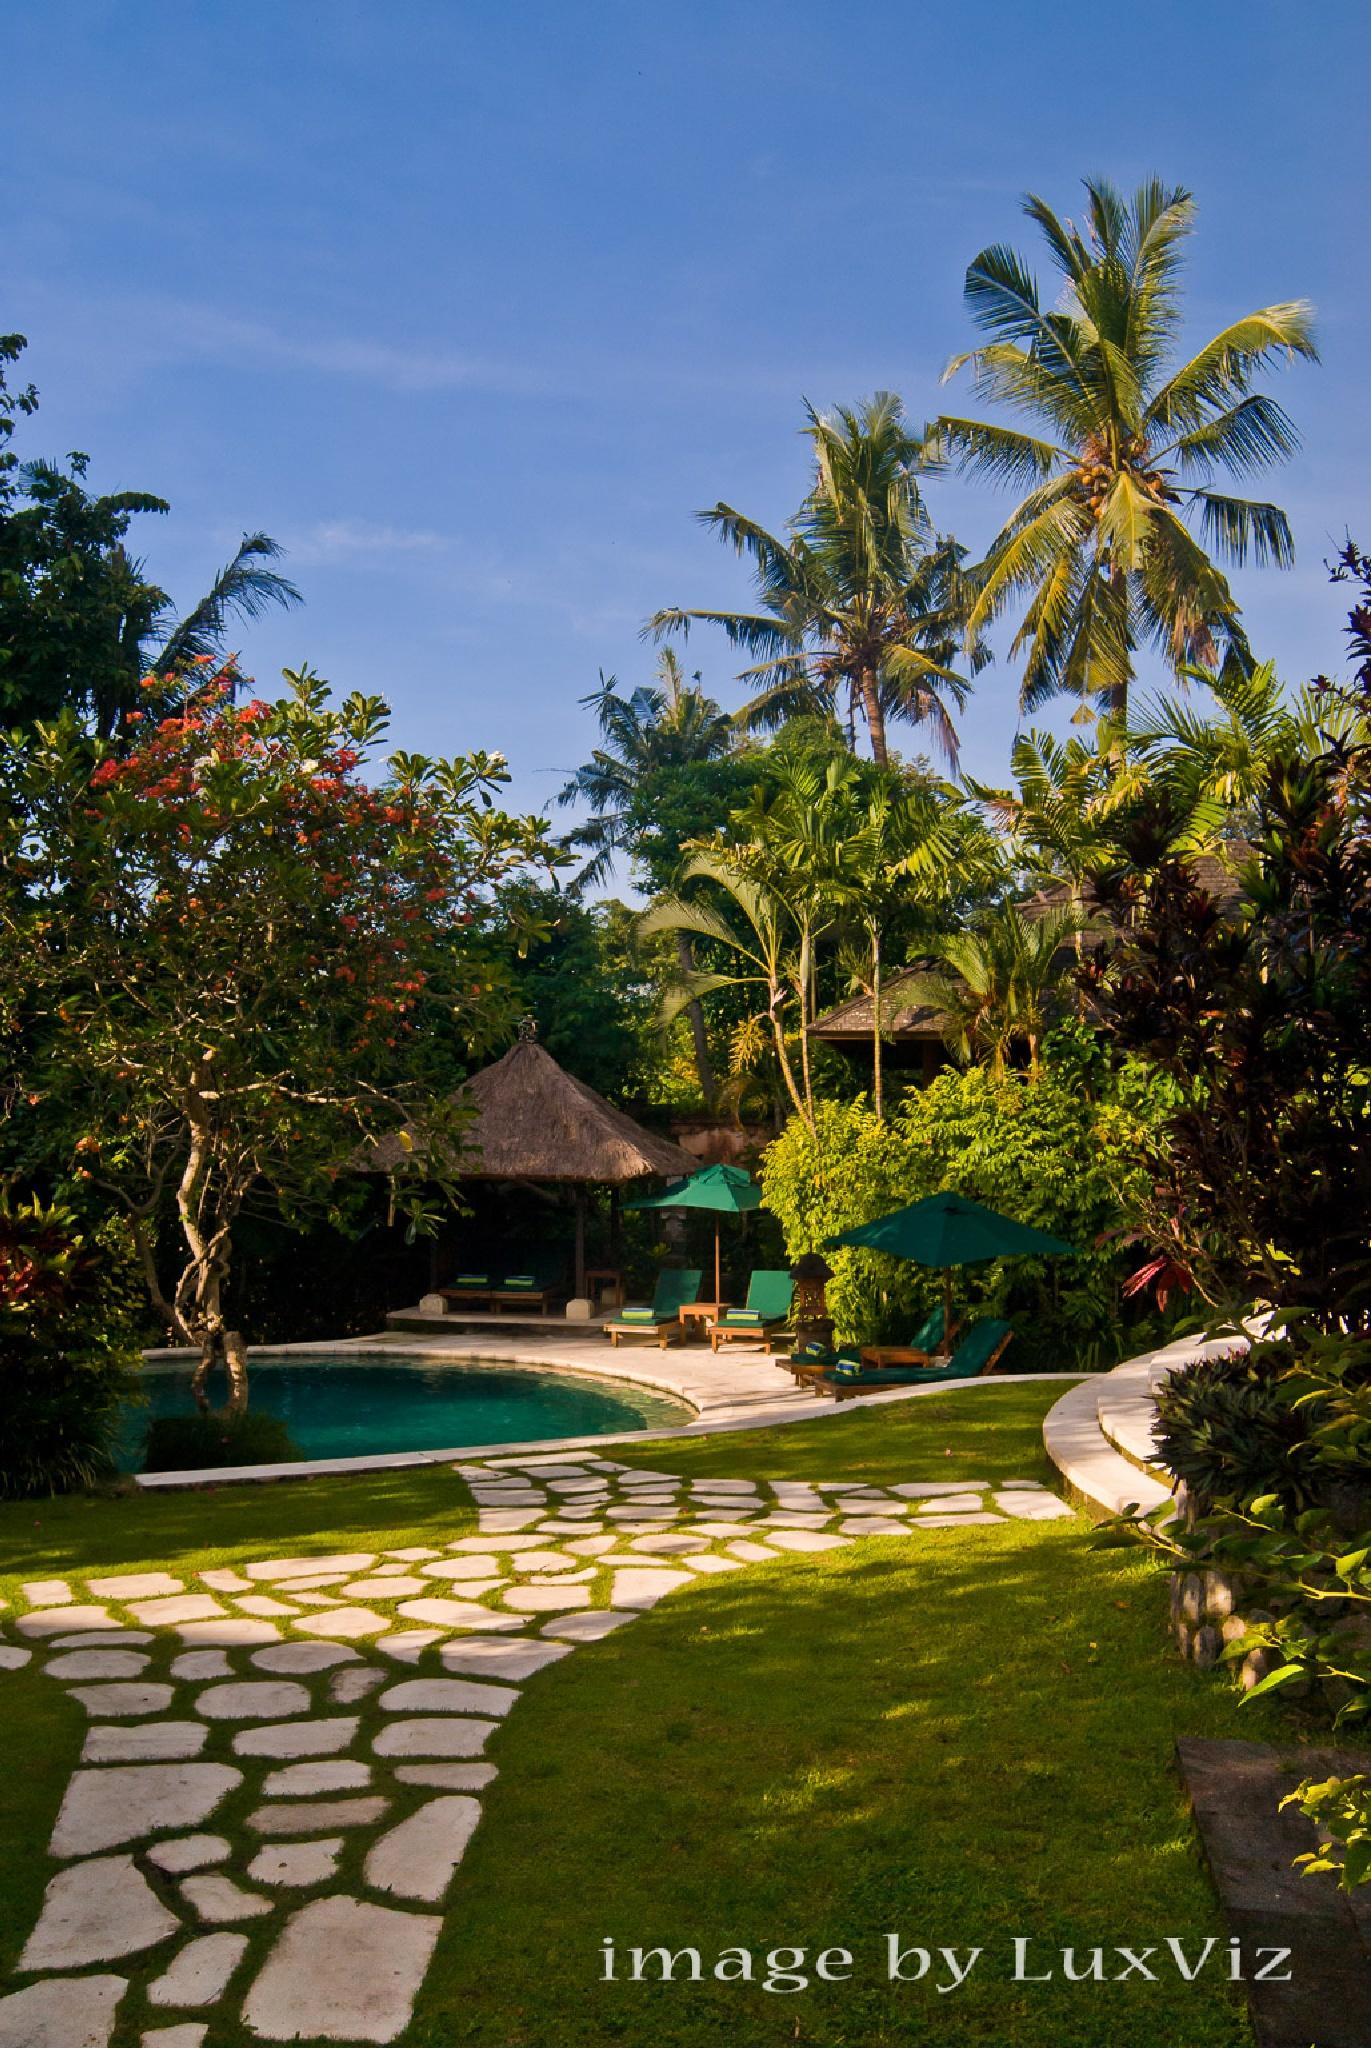 Bali Luxury Villa Photography - Villa Bougainvillea by LuxViz by Rick Carmichael